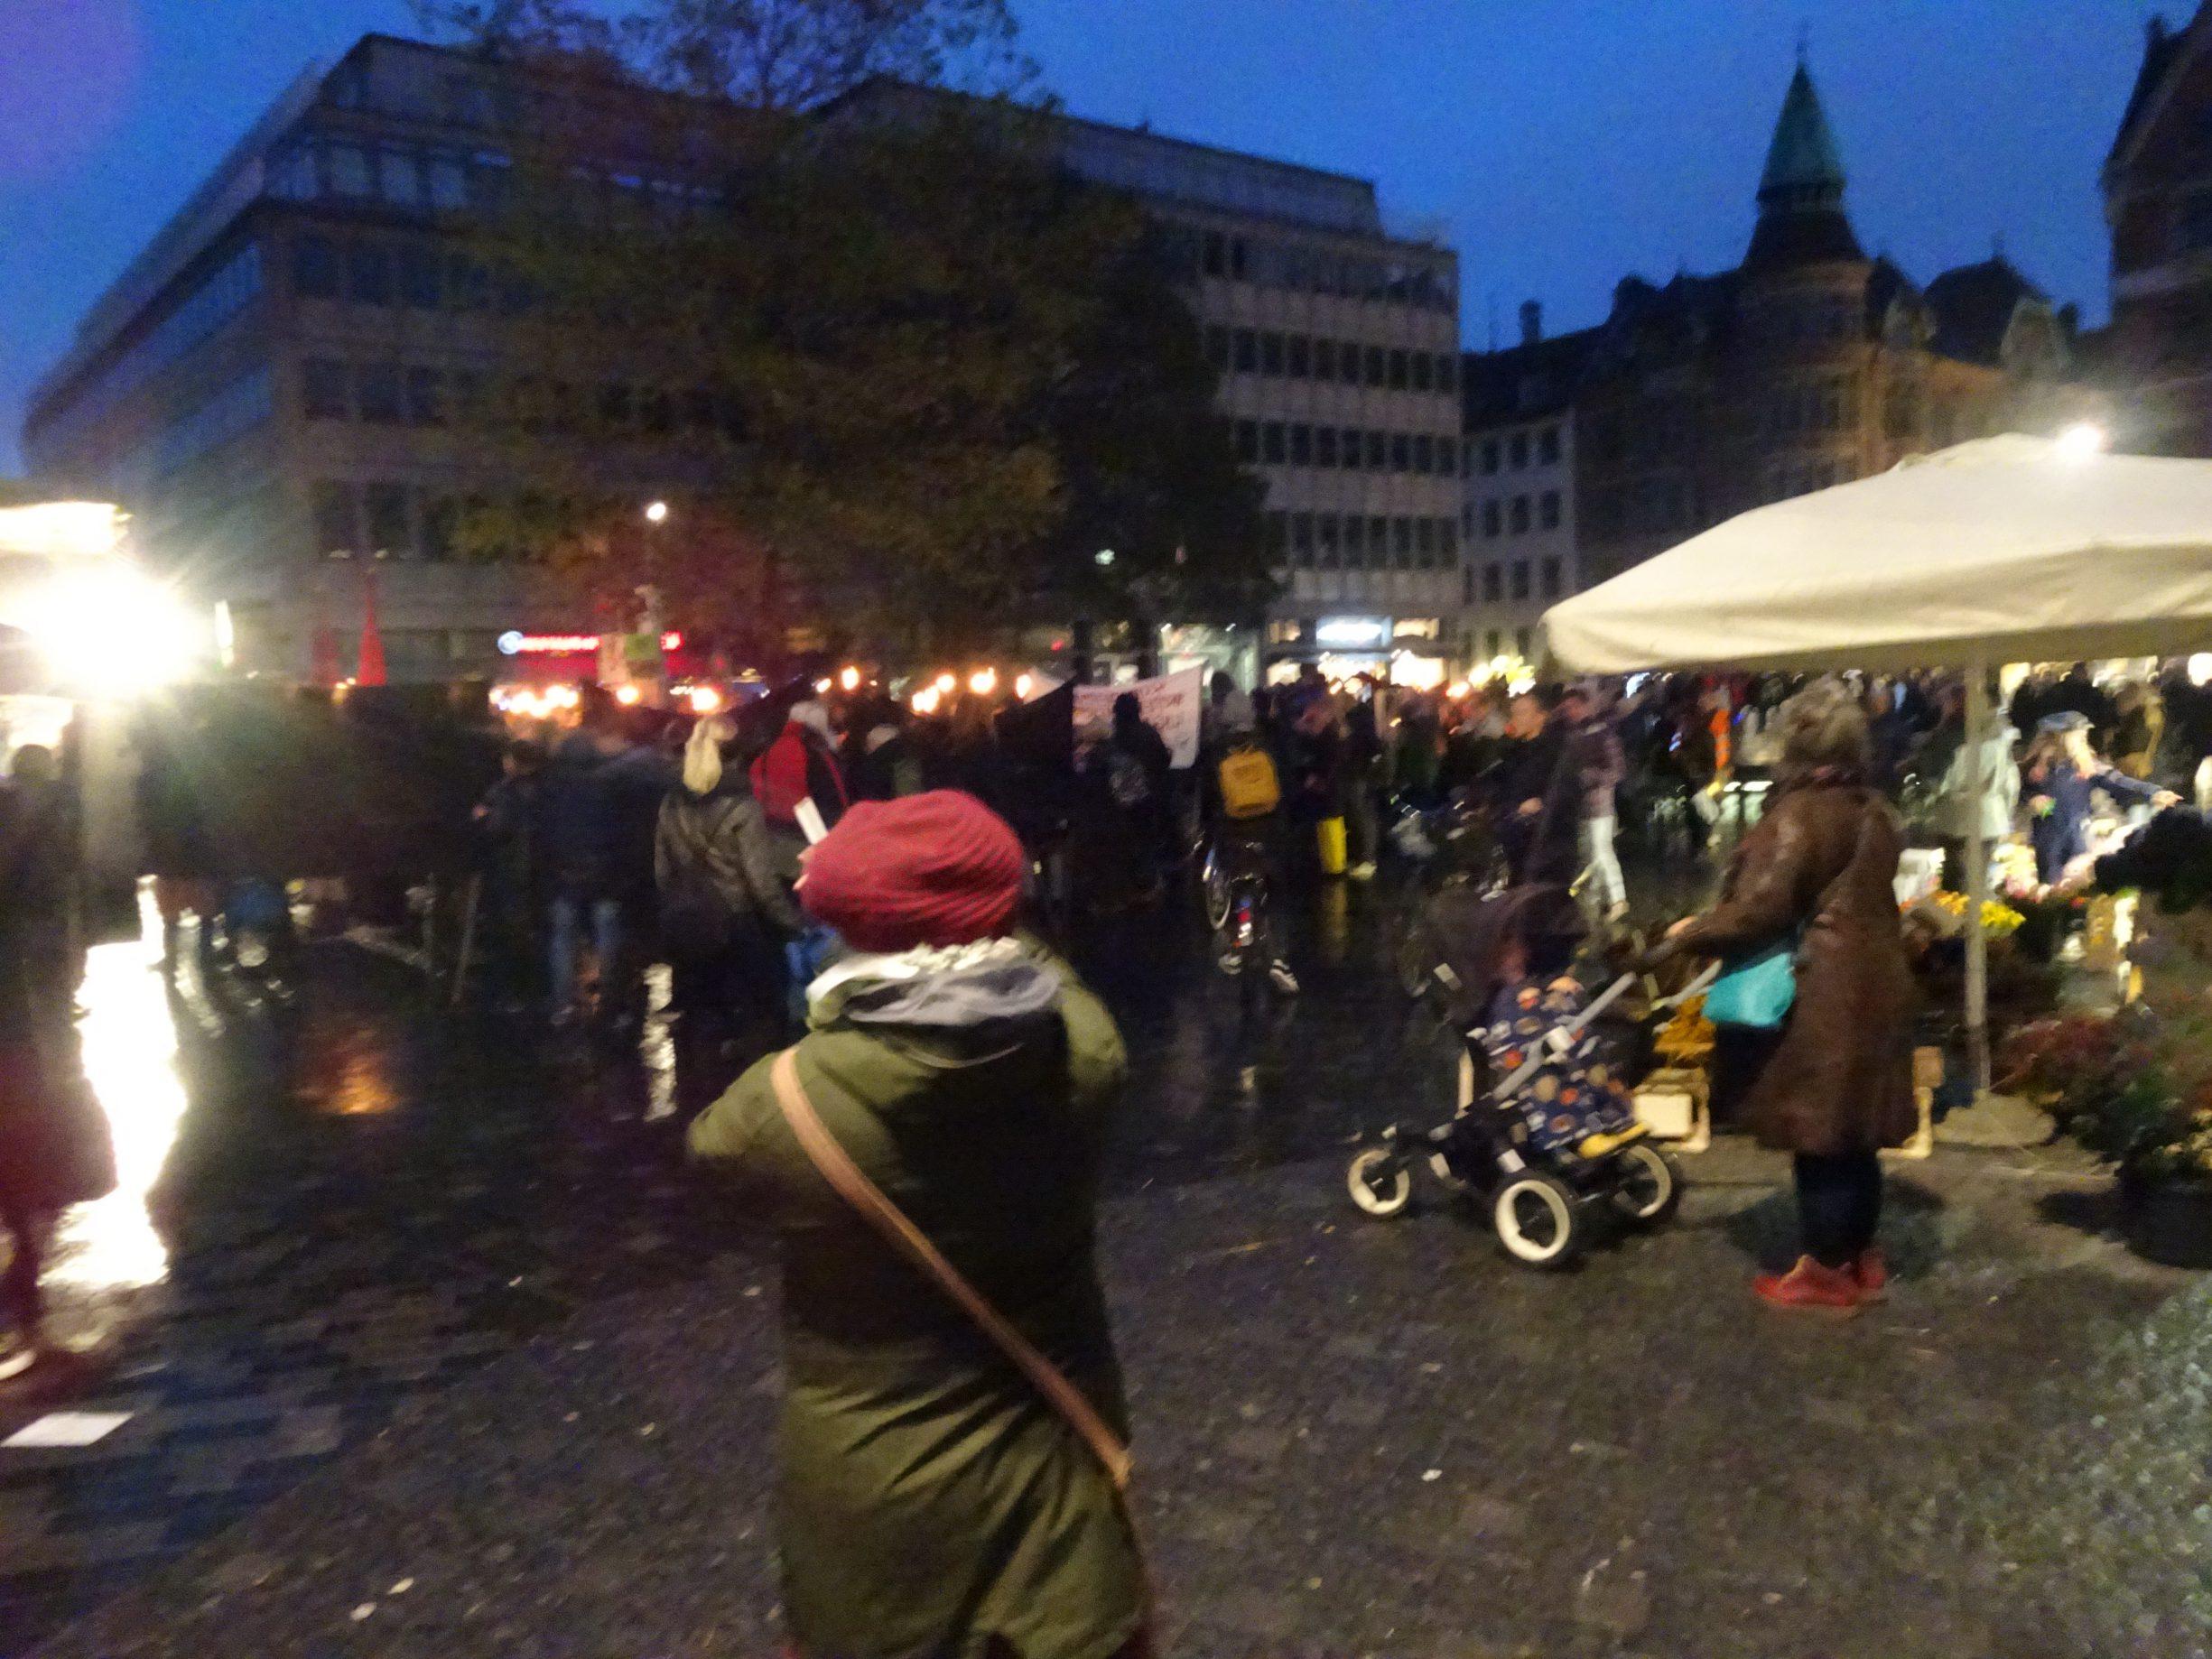 Kultorvet i København, 9 november 2019. Forto: pma.